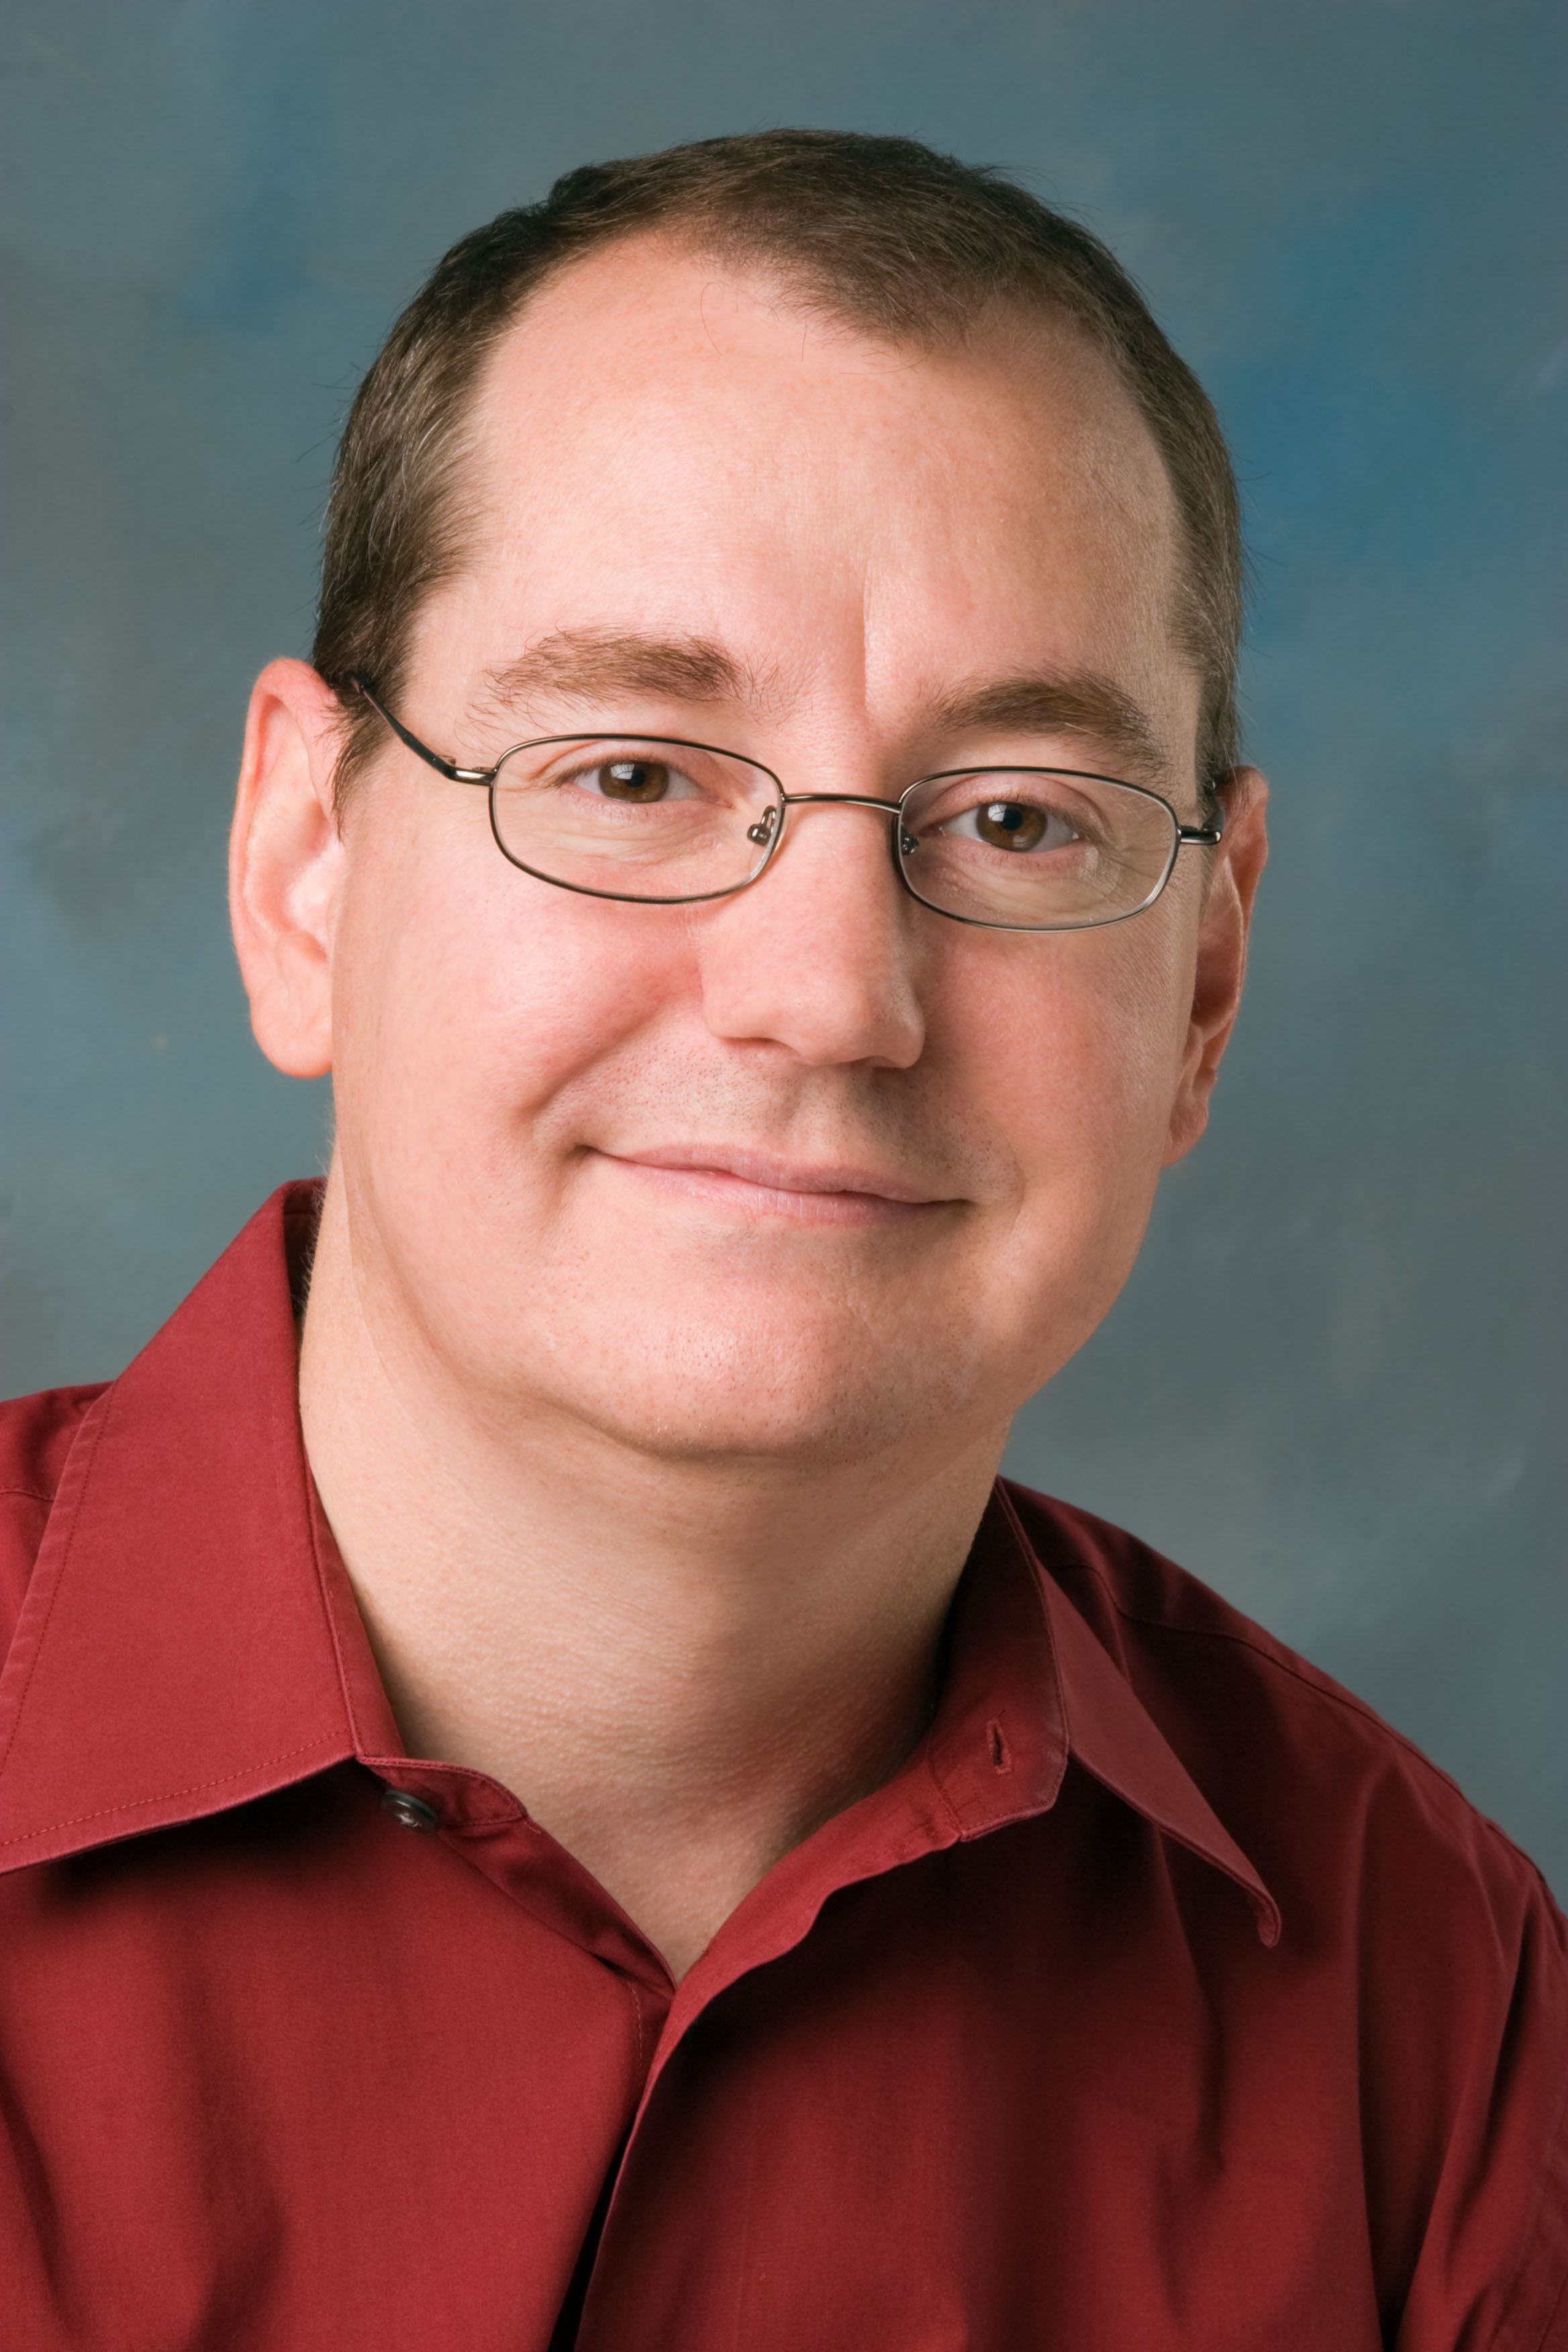 Glenn Callaghan